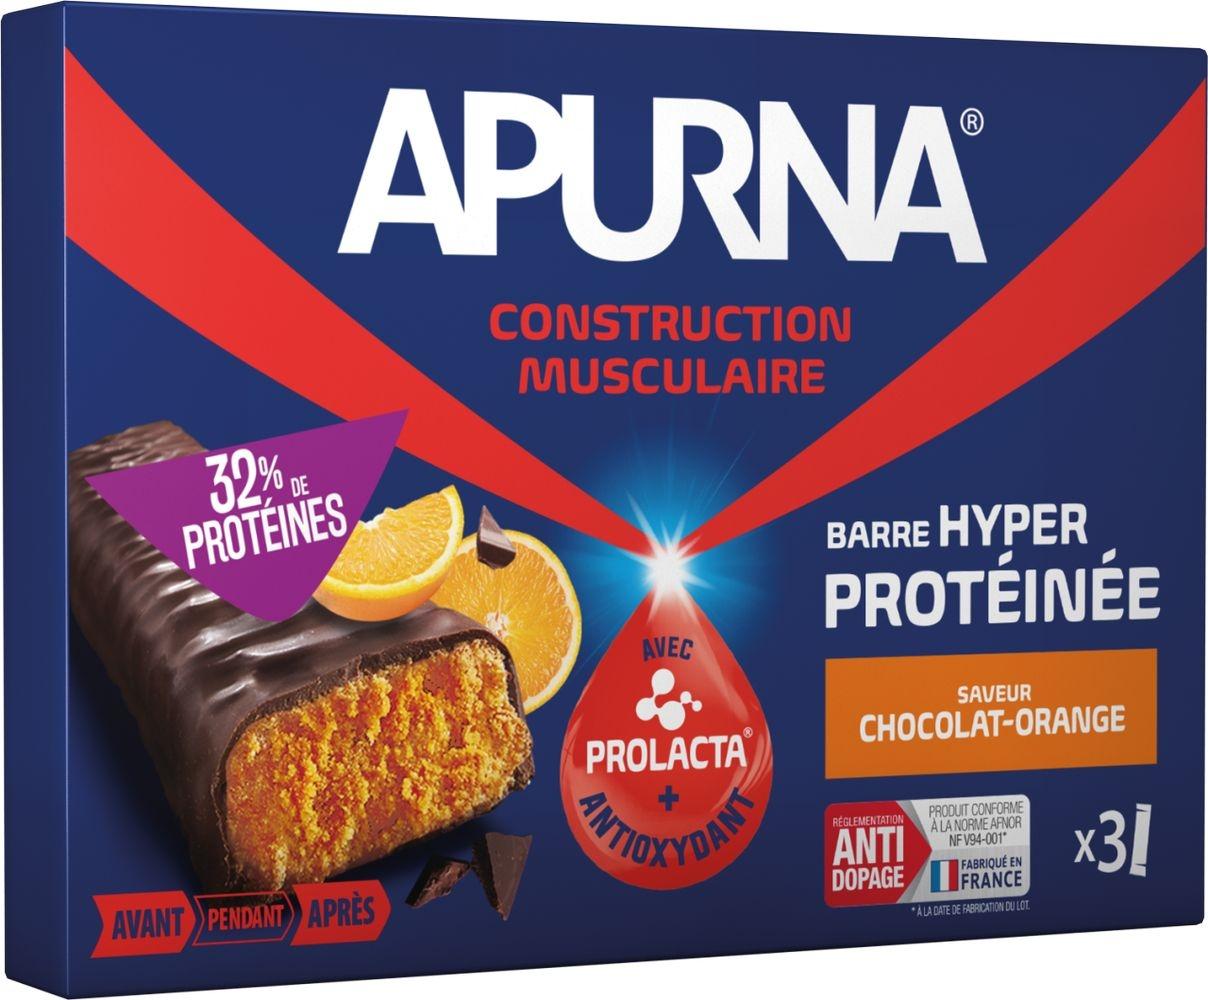 Barre hyperprotéinée Apurna Chocolat Orange Étui 3x40 g